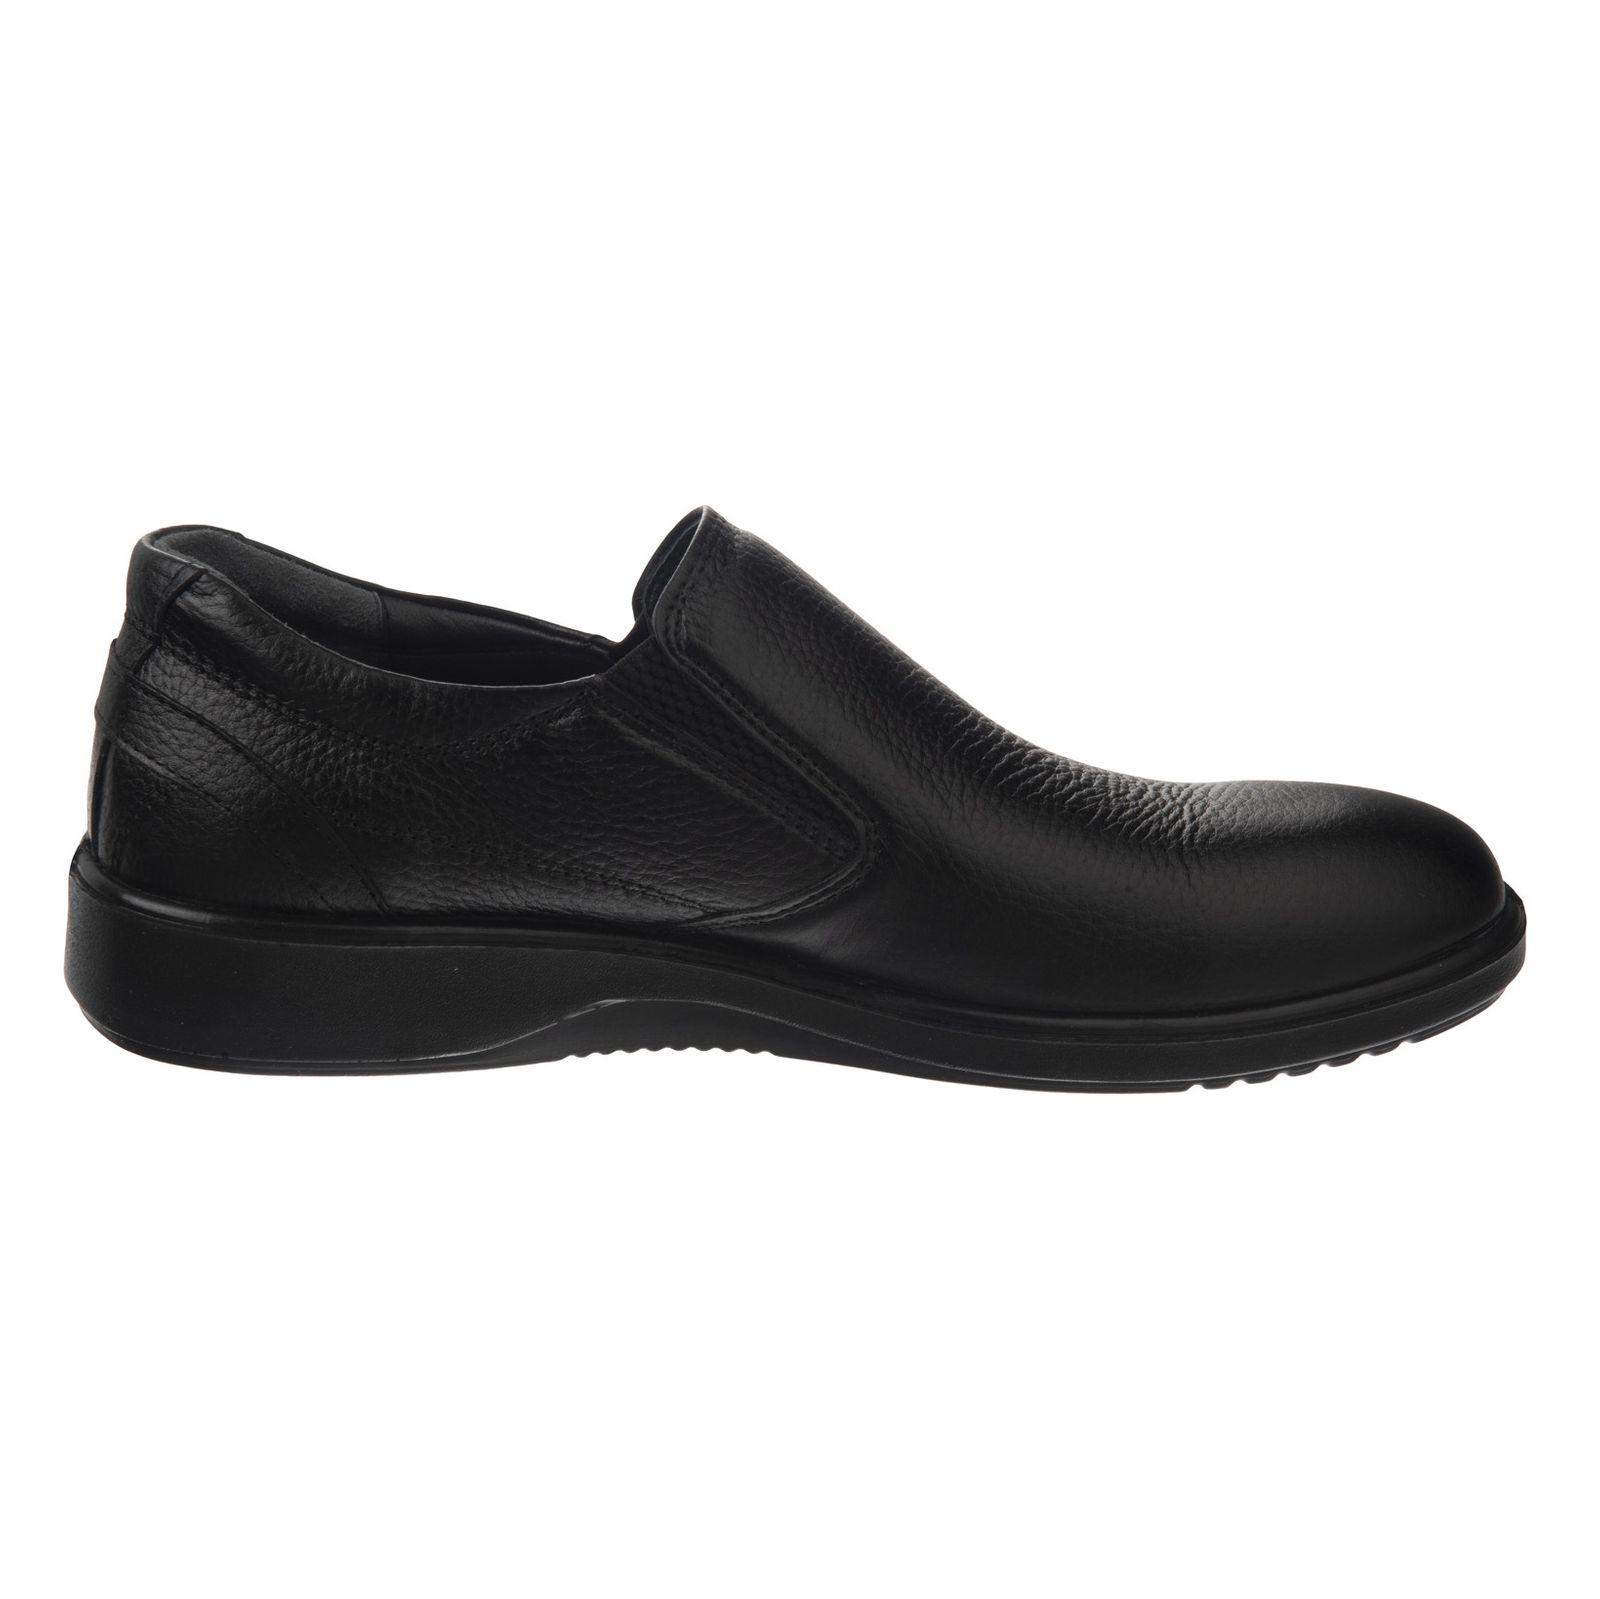 کفش روزمره مردانه شیفر مدل 7216A-101 - مشکی - 4